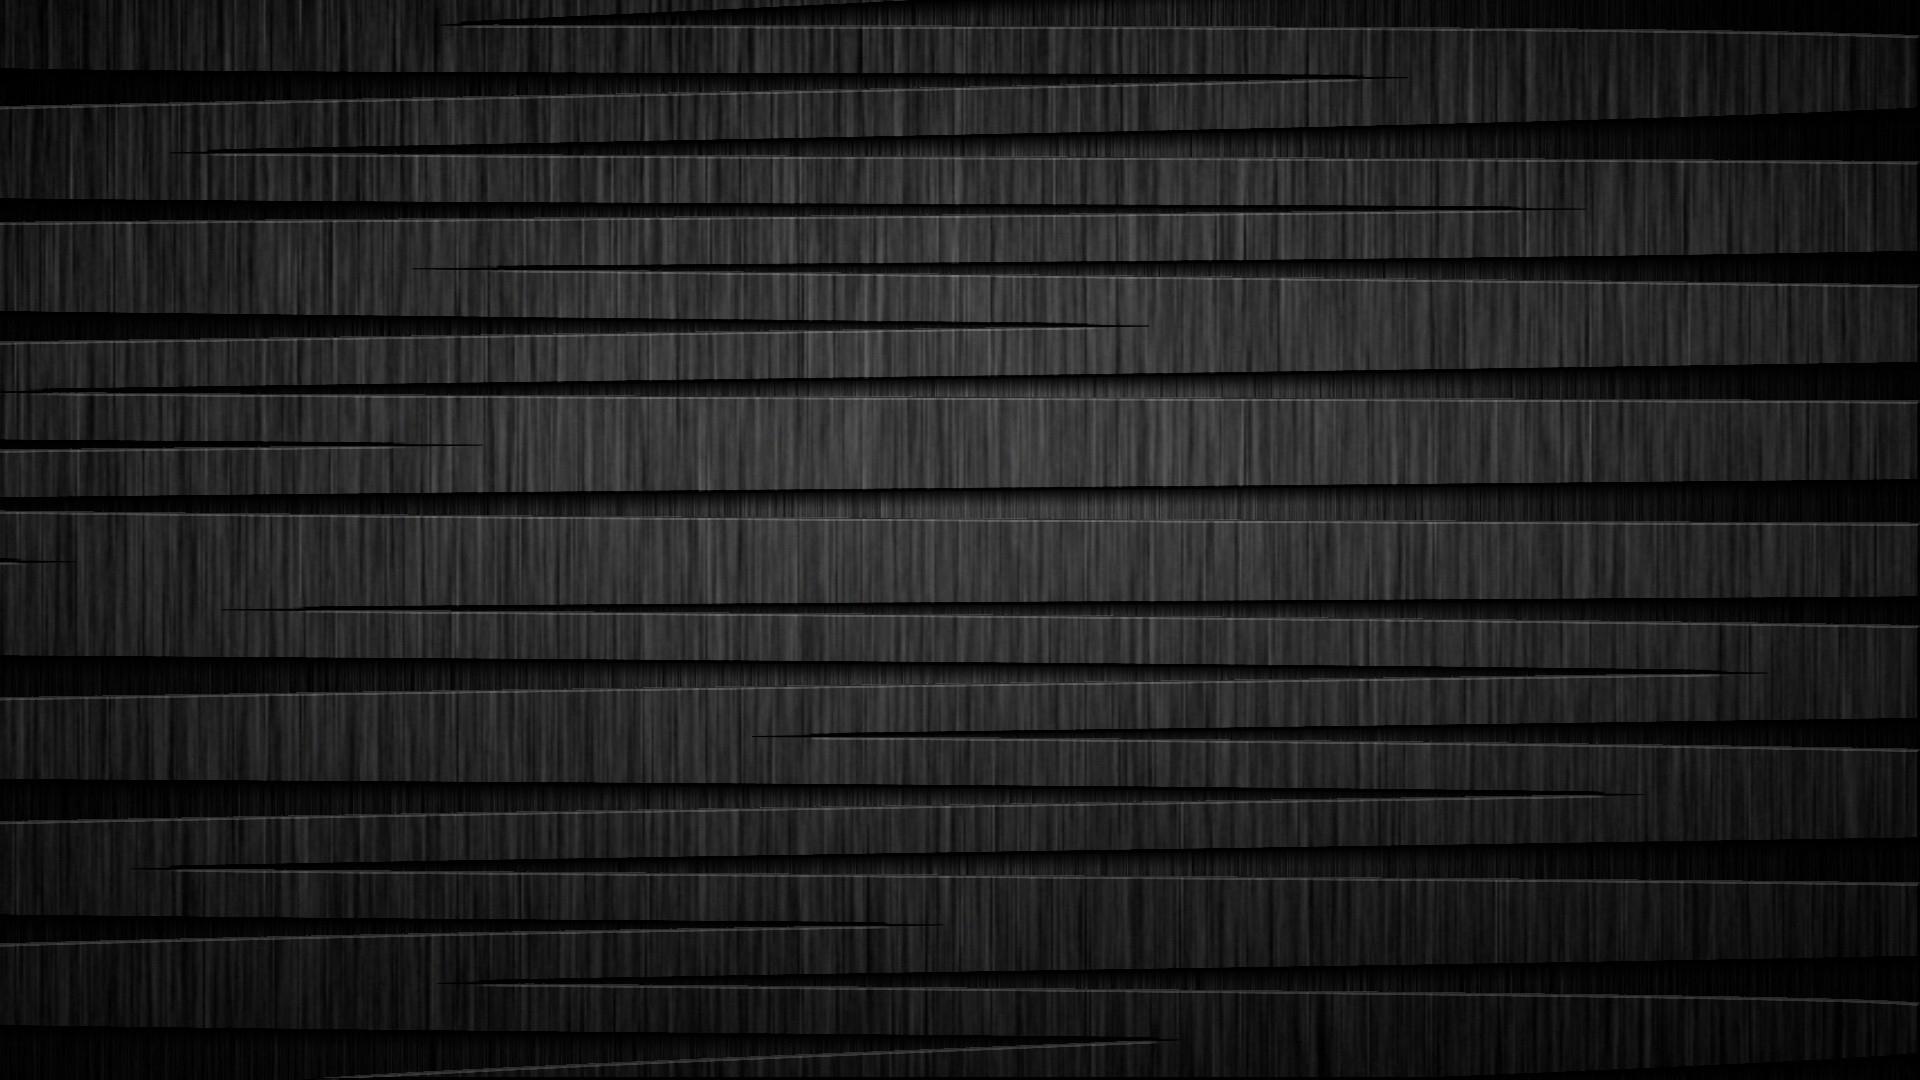 10 Best Black Abstract Background Wallpaper FULL HD 1920×1080 For PC Desktop